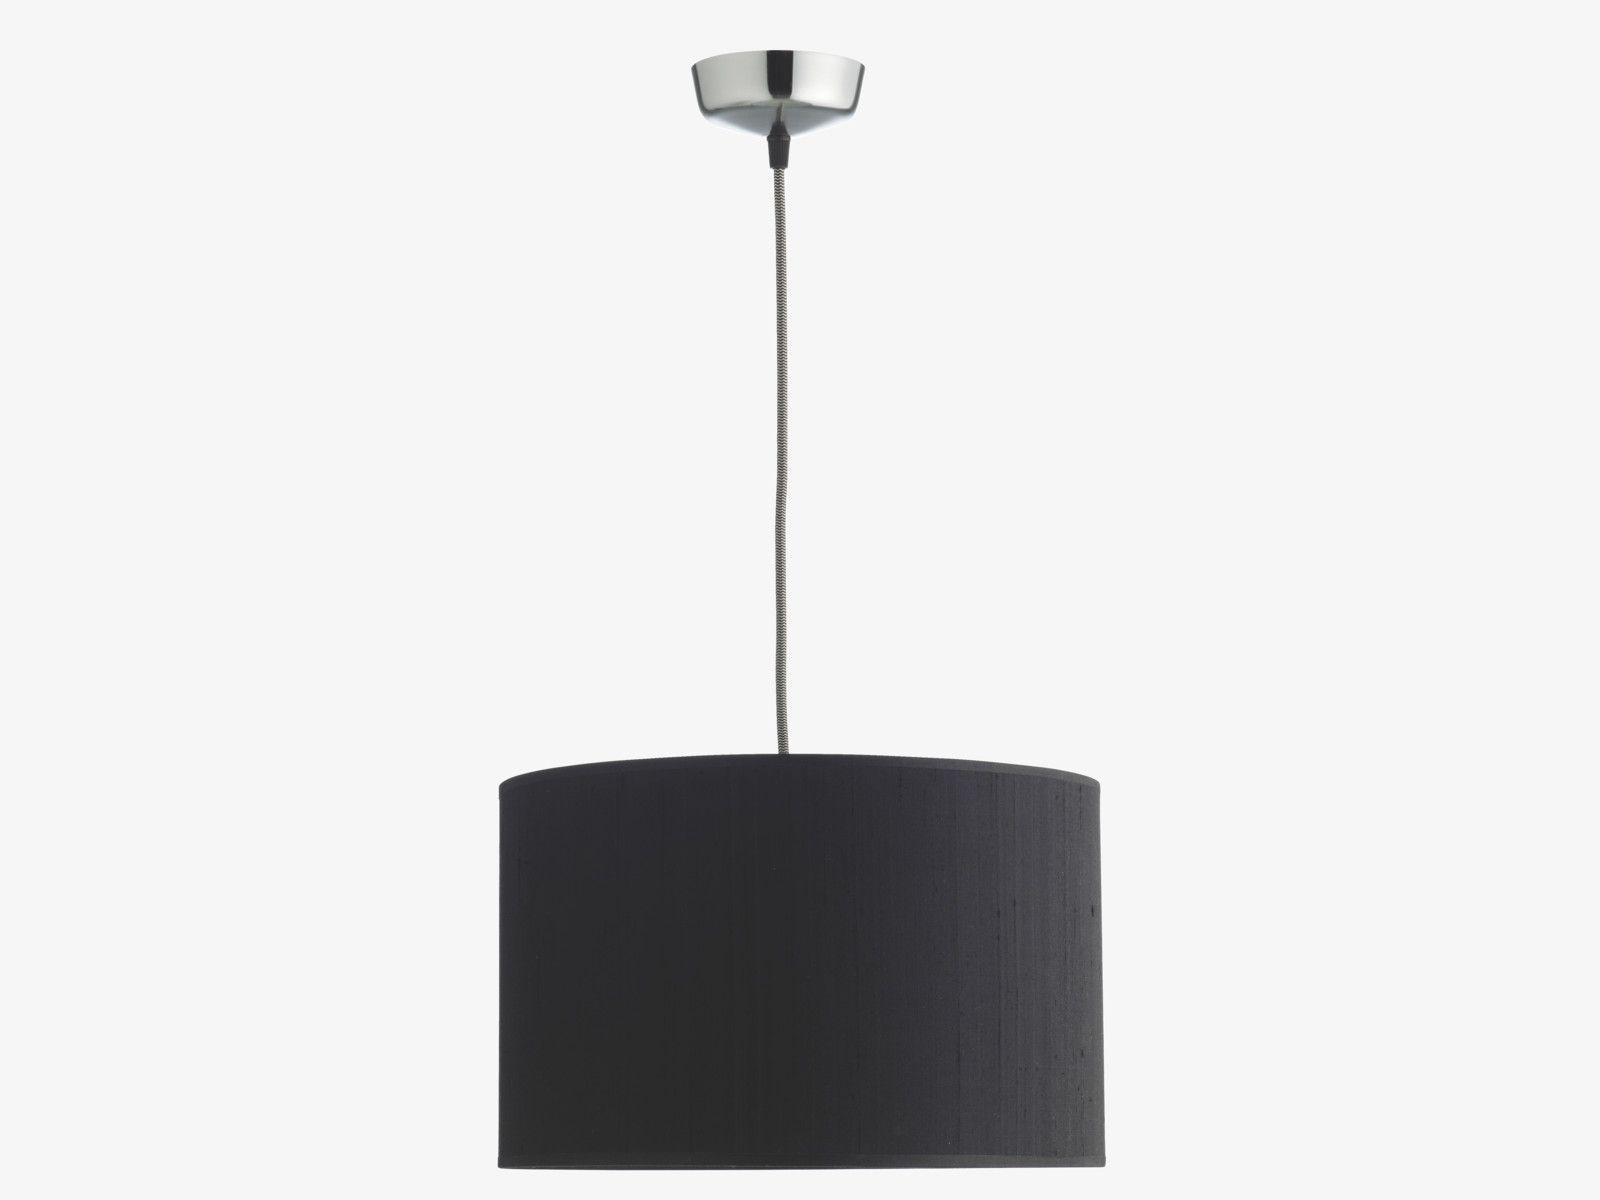 habitat lampen pinterest pendant light fitting light fittings and pendant lighting. Black Bedroom Furniture Sets. Home Design Ideas